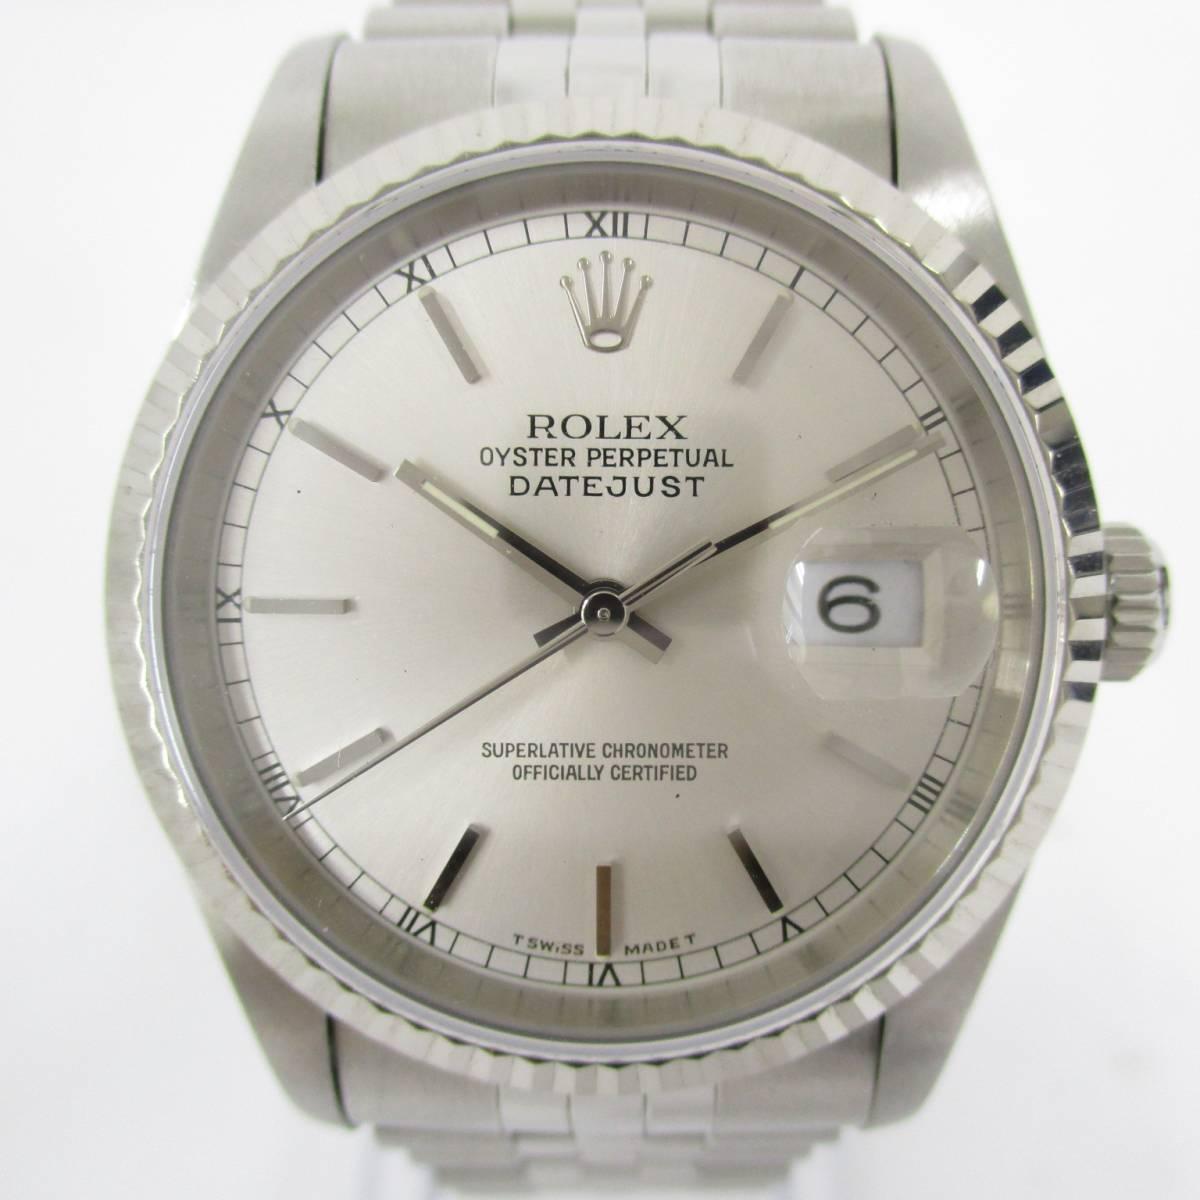 ROLEX ロレックス OYSTER PERPETUAL オイスターパーペチュアル DATEJUST デイトジャスト 16234 T番 メンズ 腕時計 自動巻き 大ReB08 0522 2